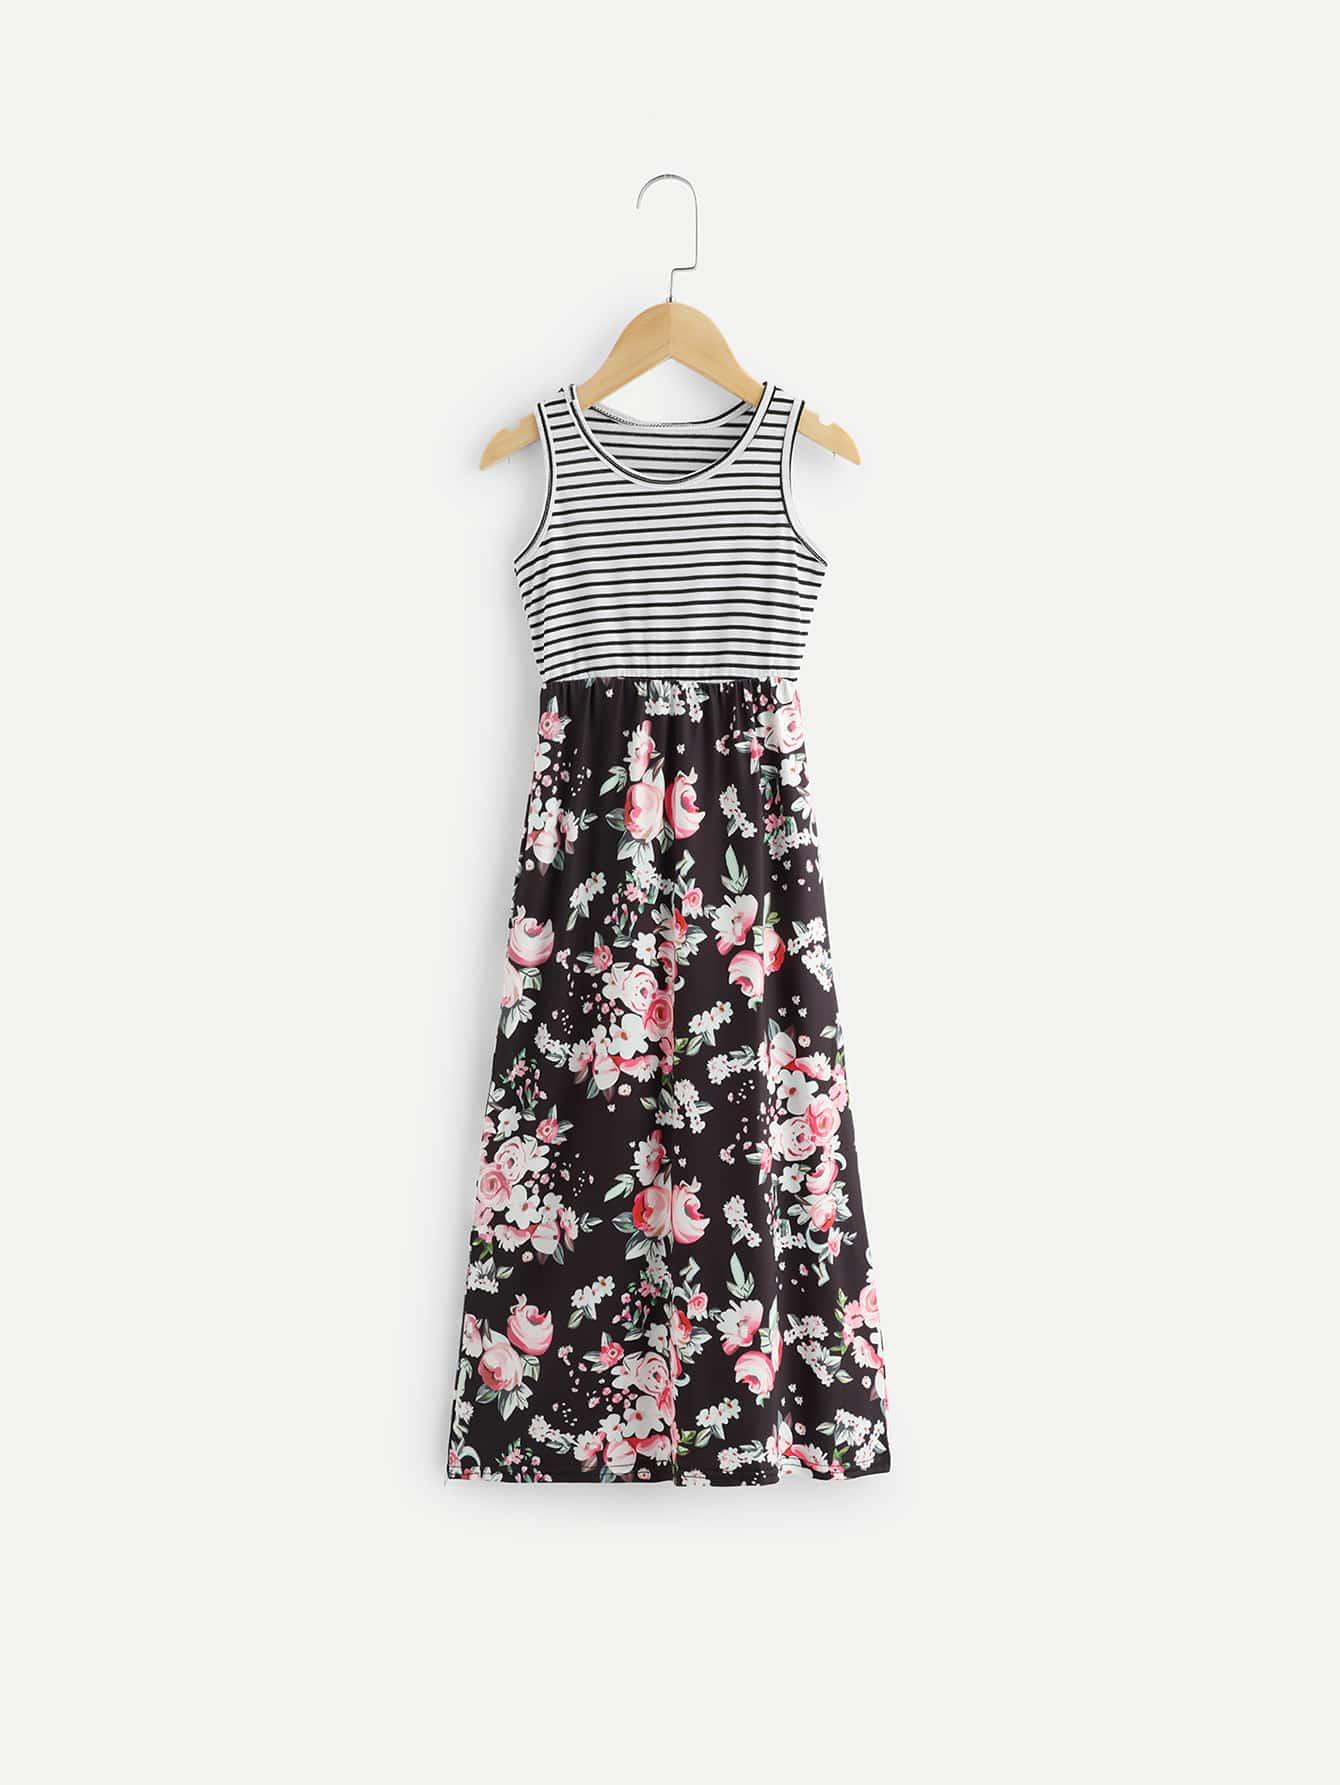 Girls Contrast Striped Floral Print Sleeveless Dress